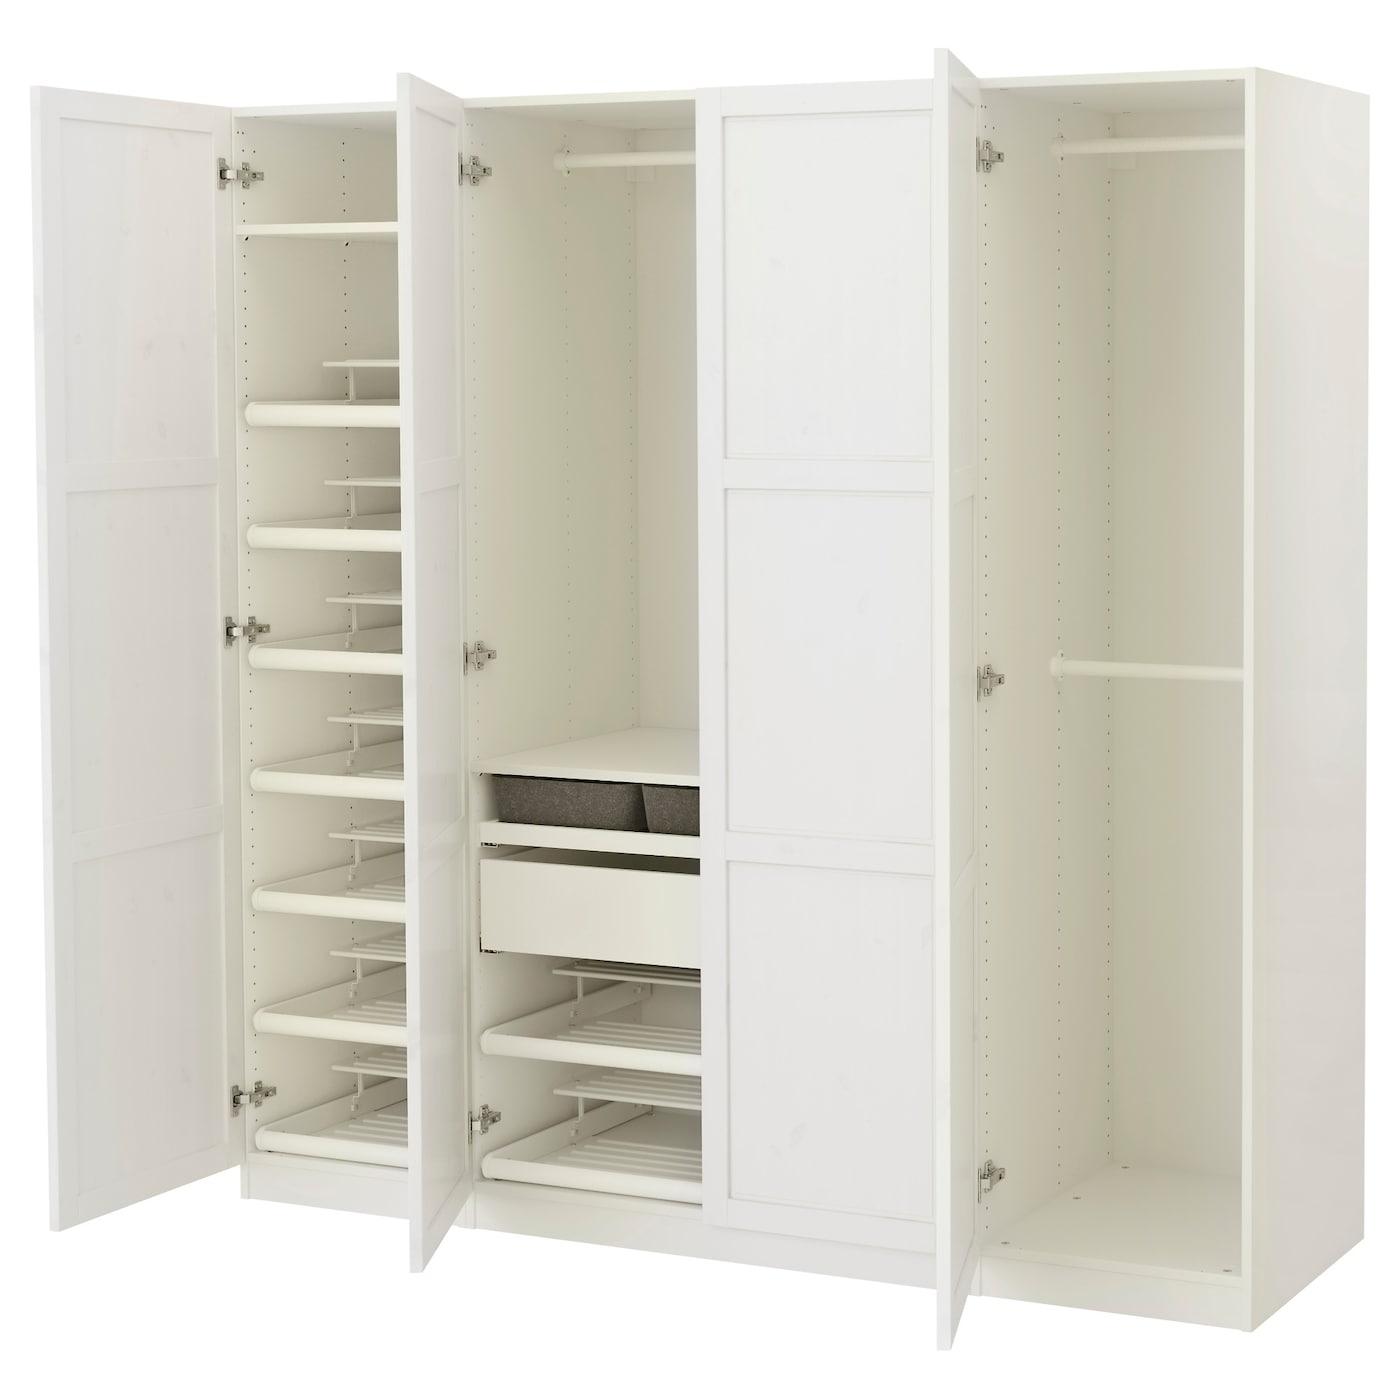 PAX Wardrobe White hemnes white stain 200x60x201 cm IKEA